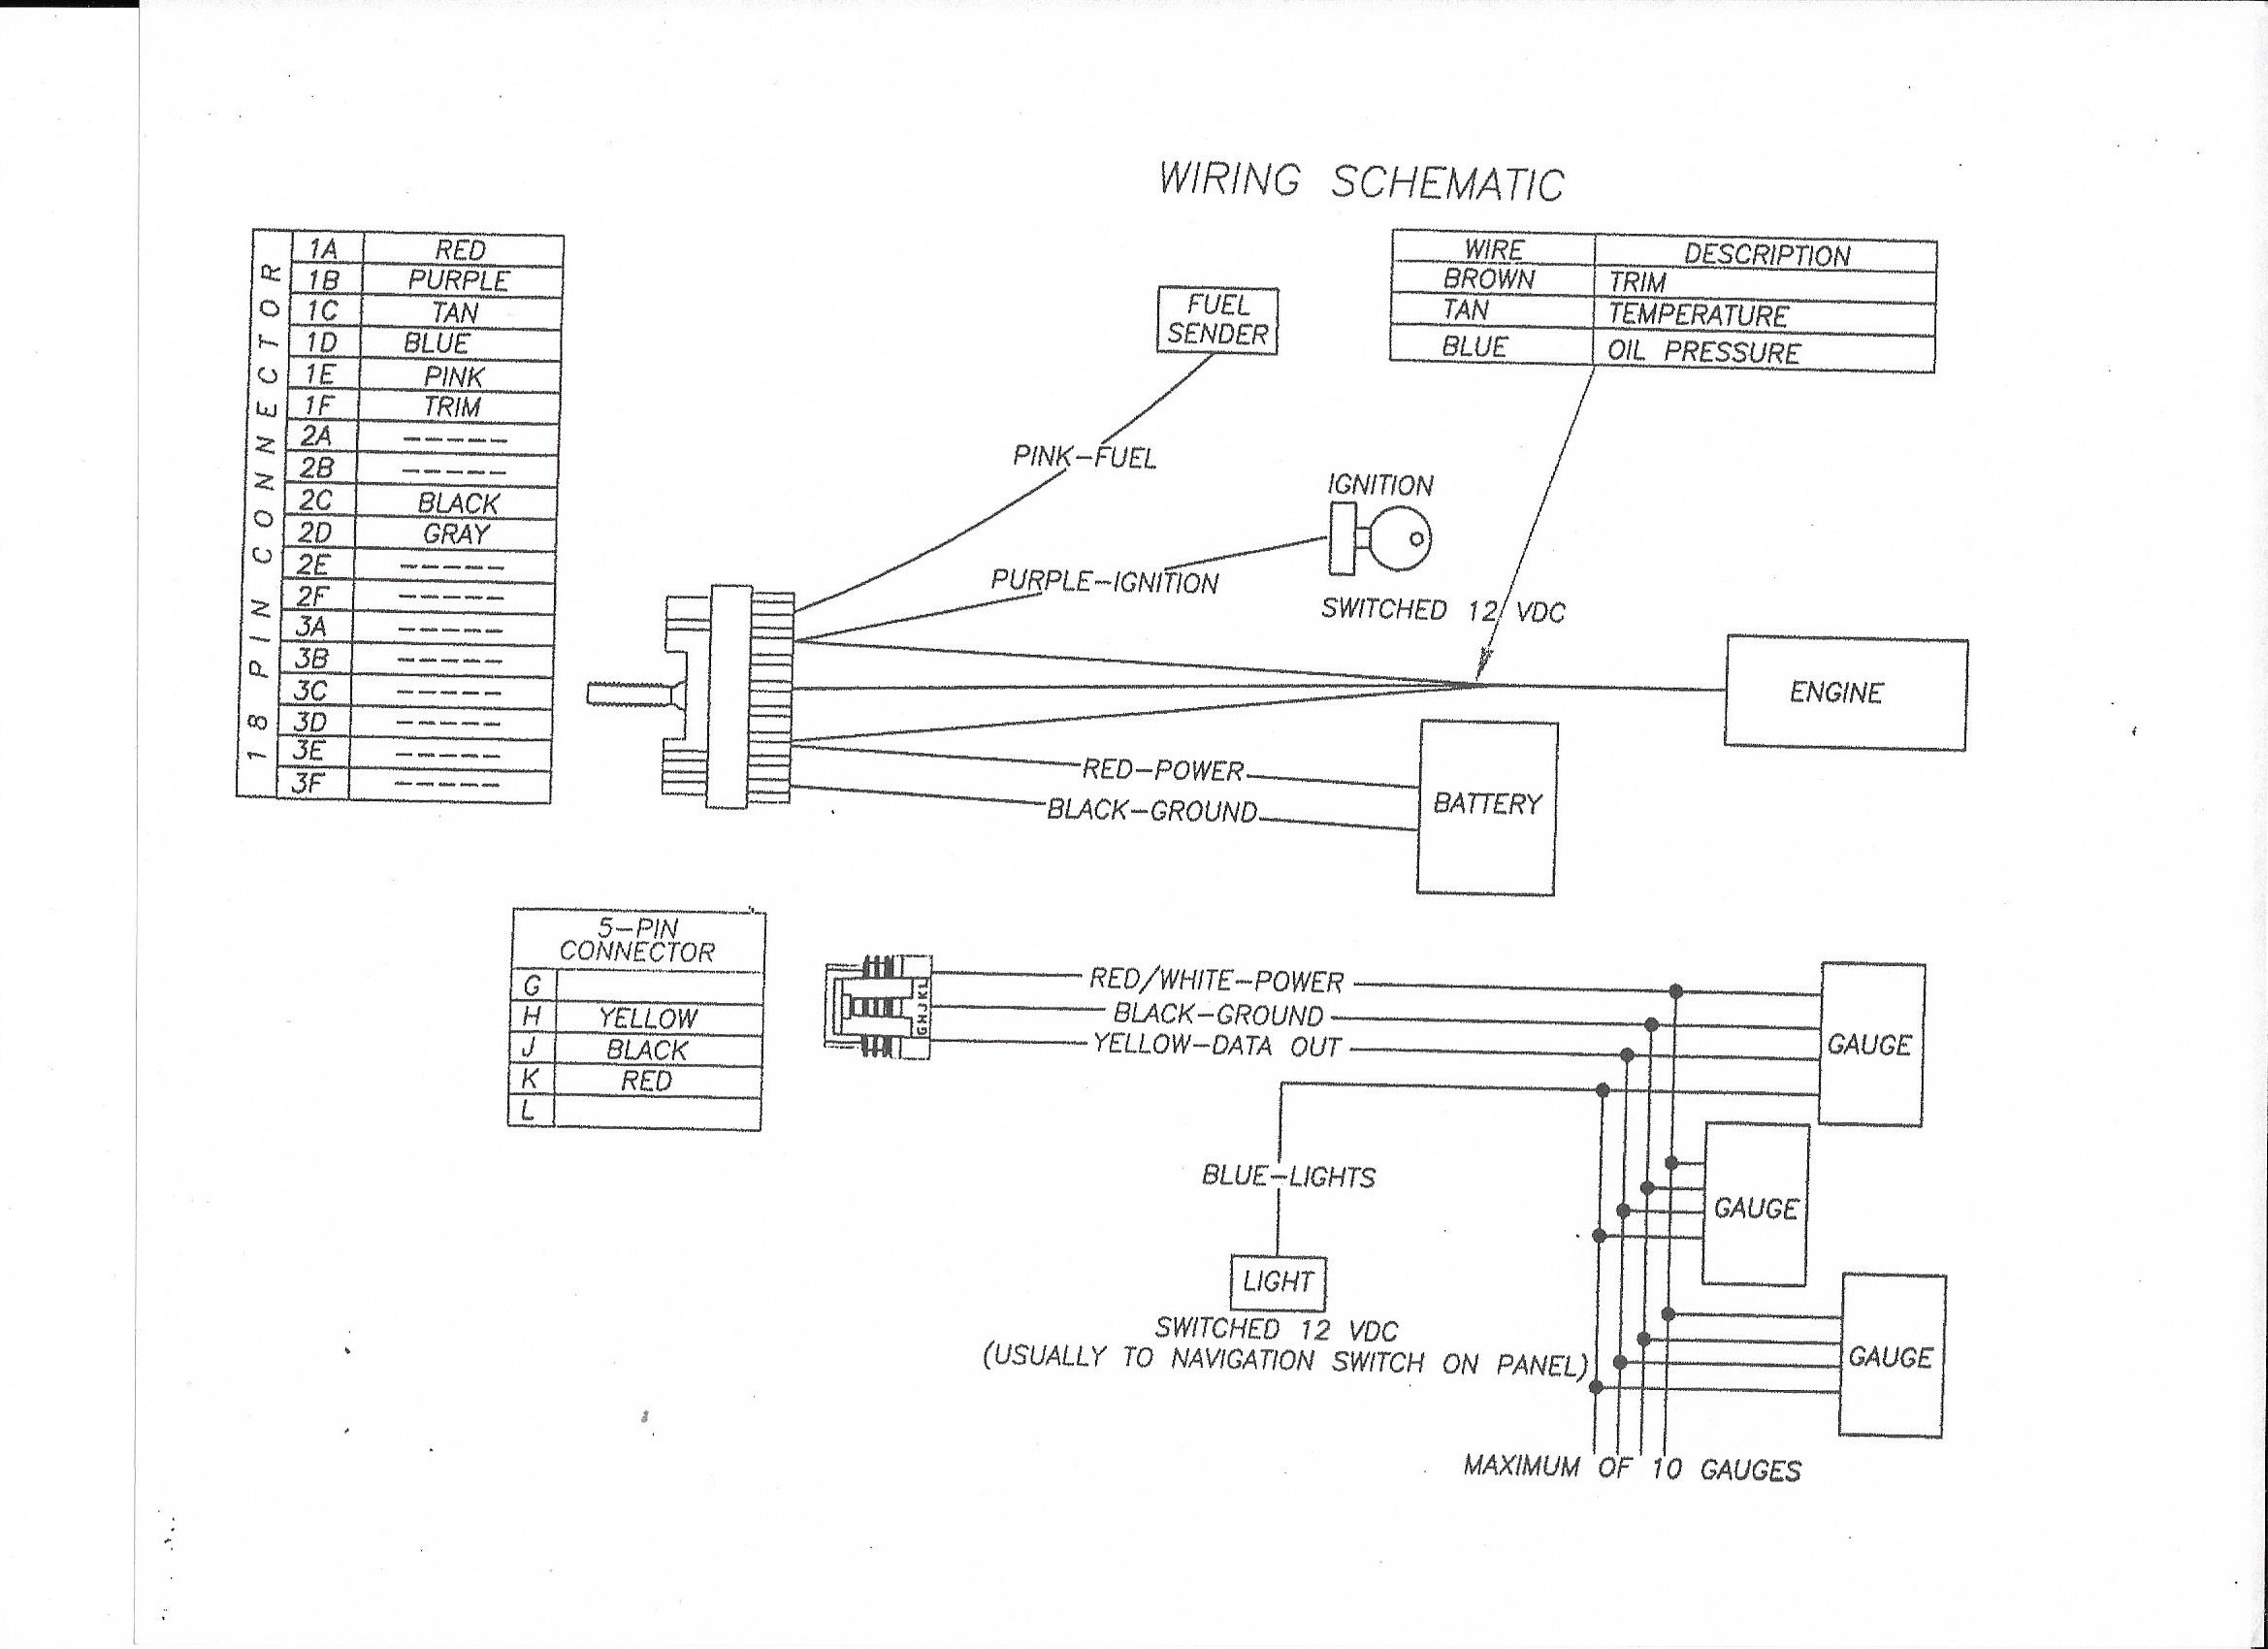 Diagram Oliver 1600 Wiring Diagram Full Version Hd Quality Wiring Diagram Mediagrame Pasticceriadefiorenze It